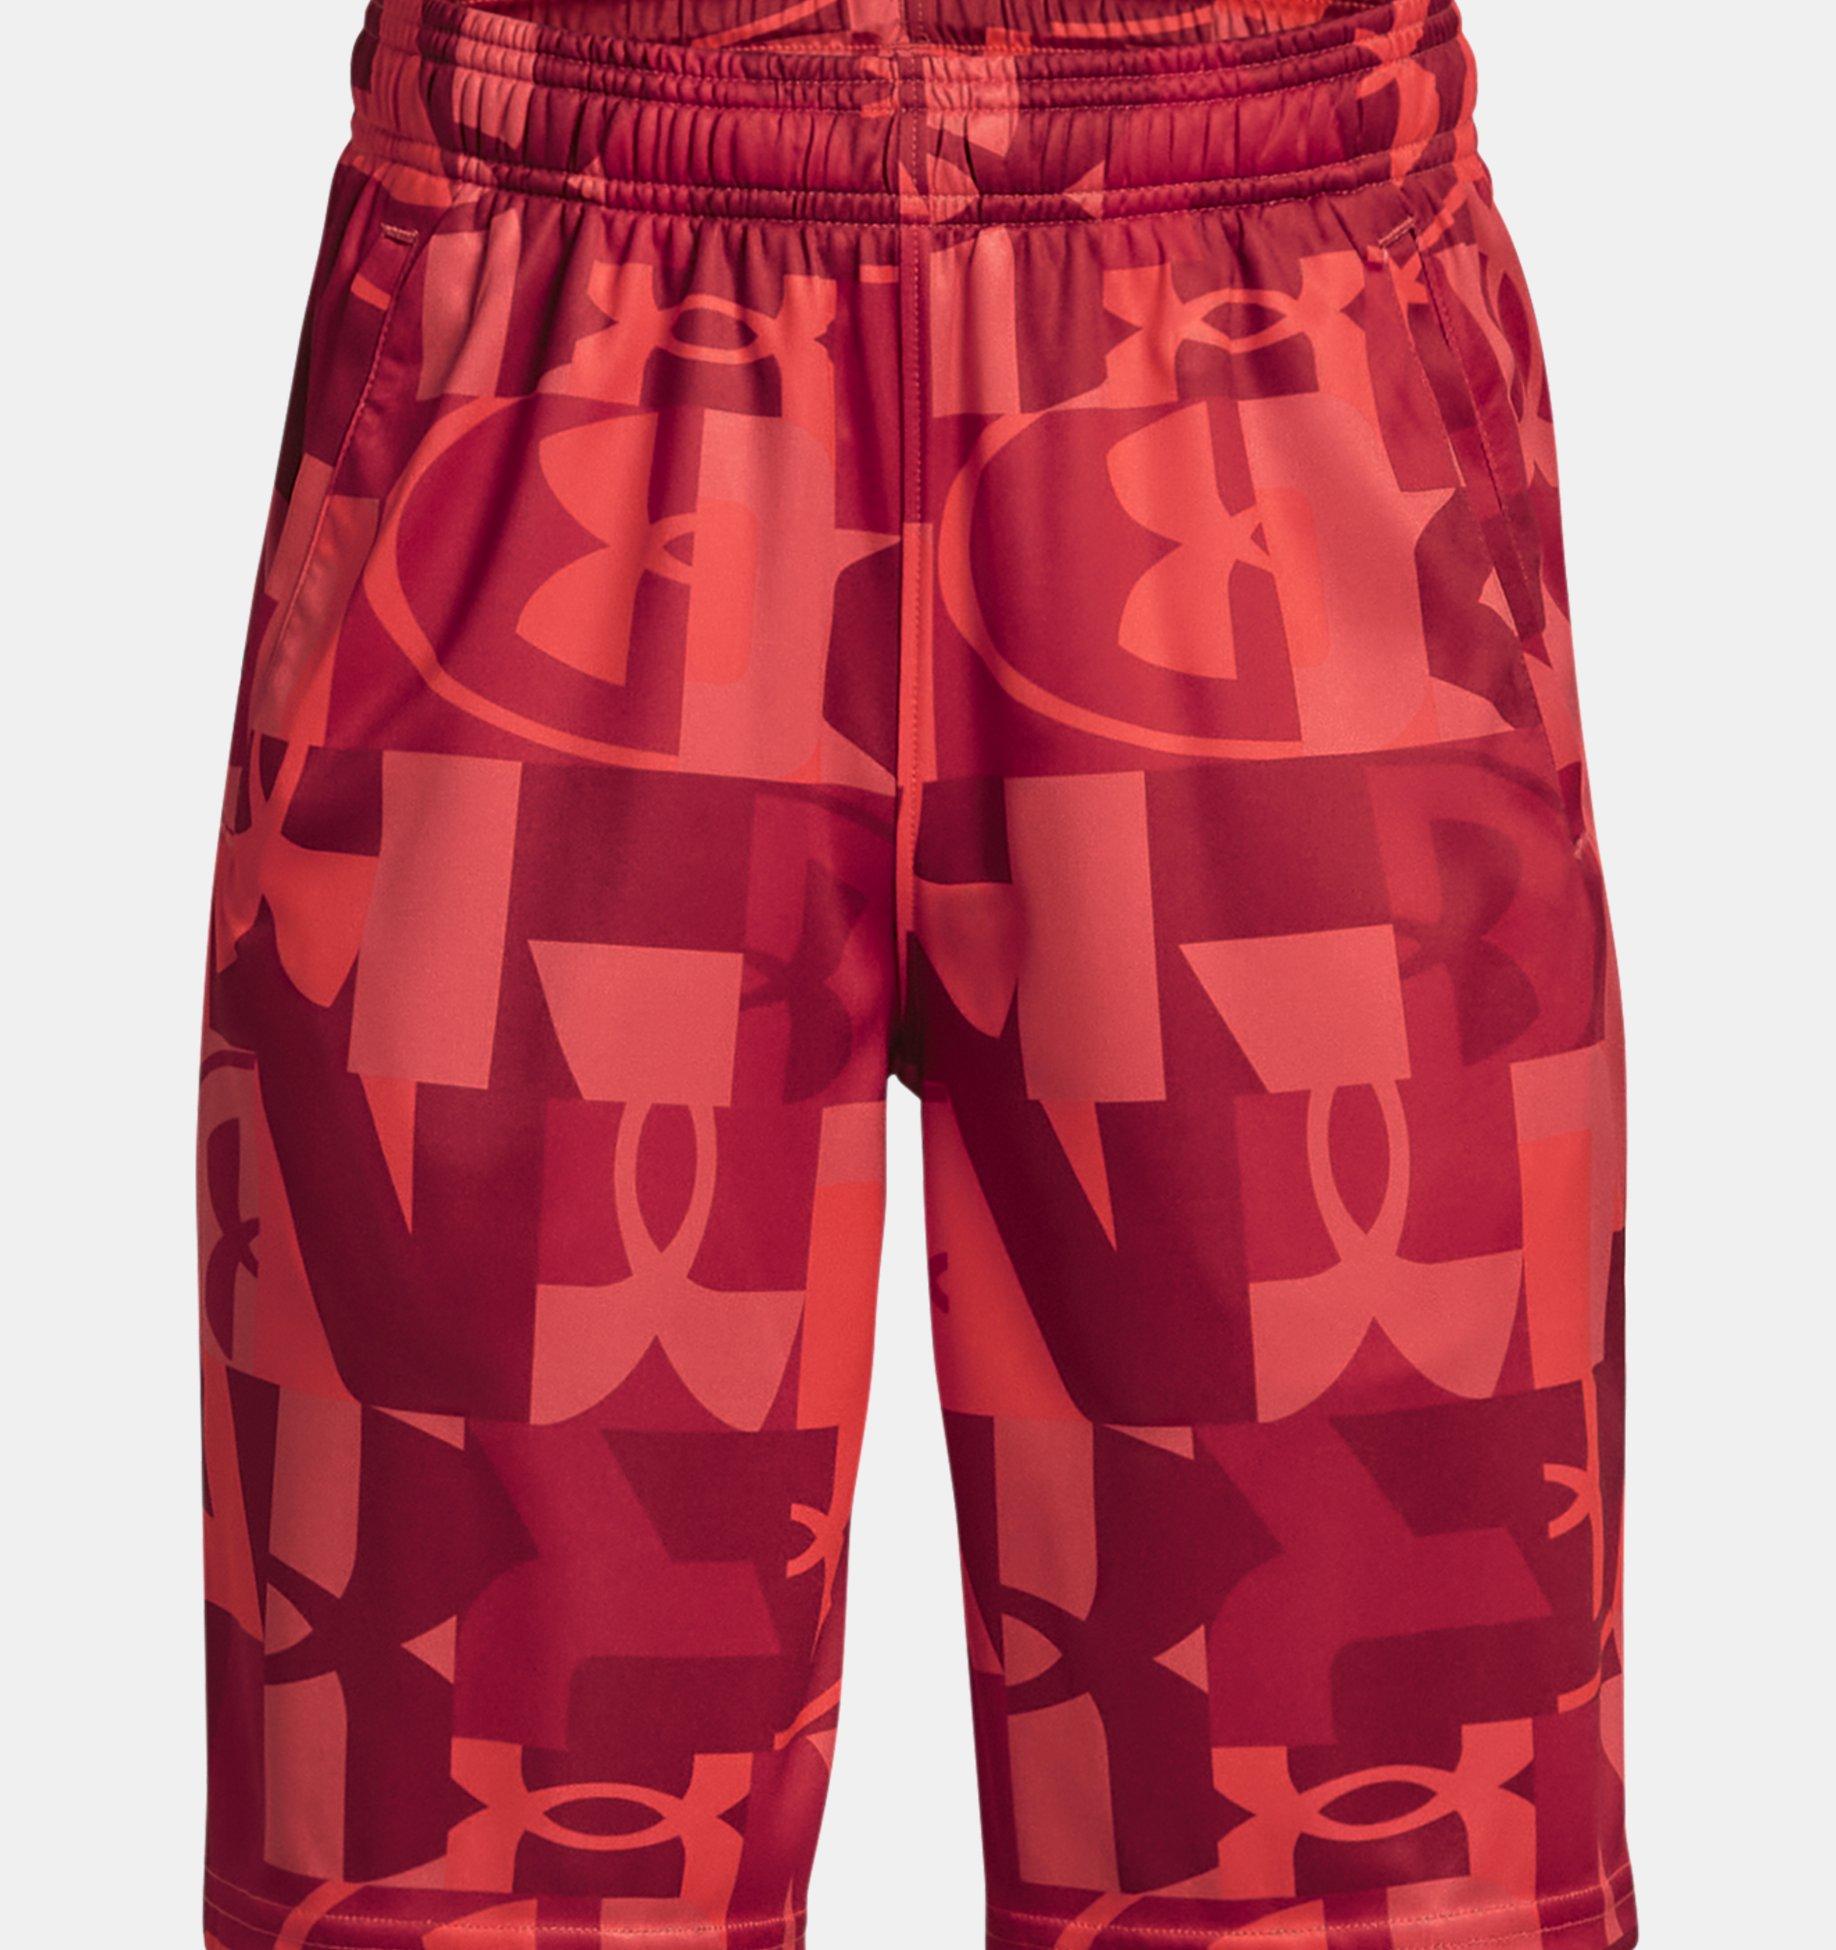 Underarmour Boys UA Renegade 3.0 Printed Shorts